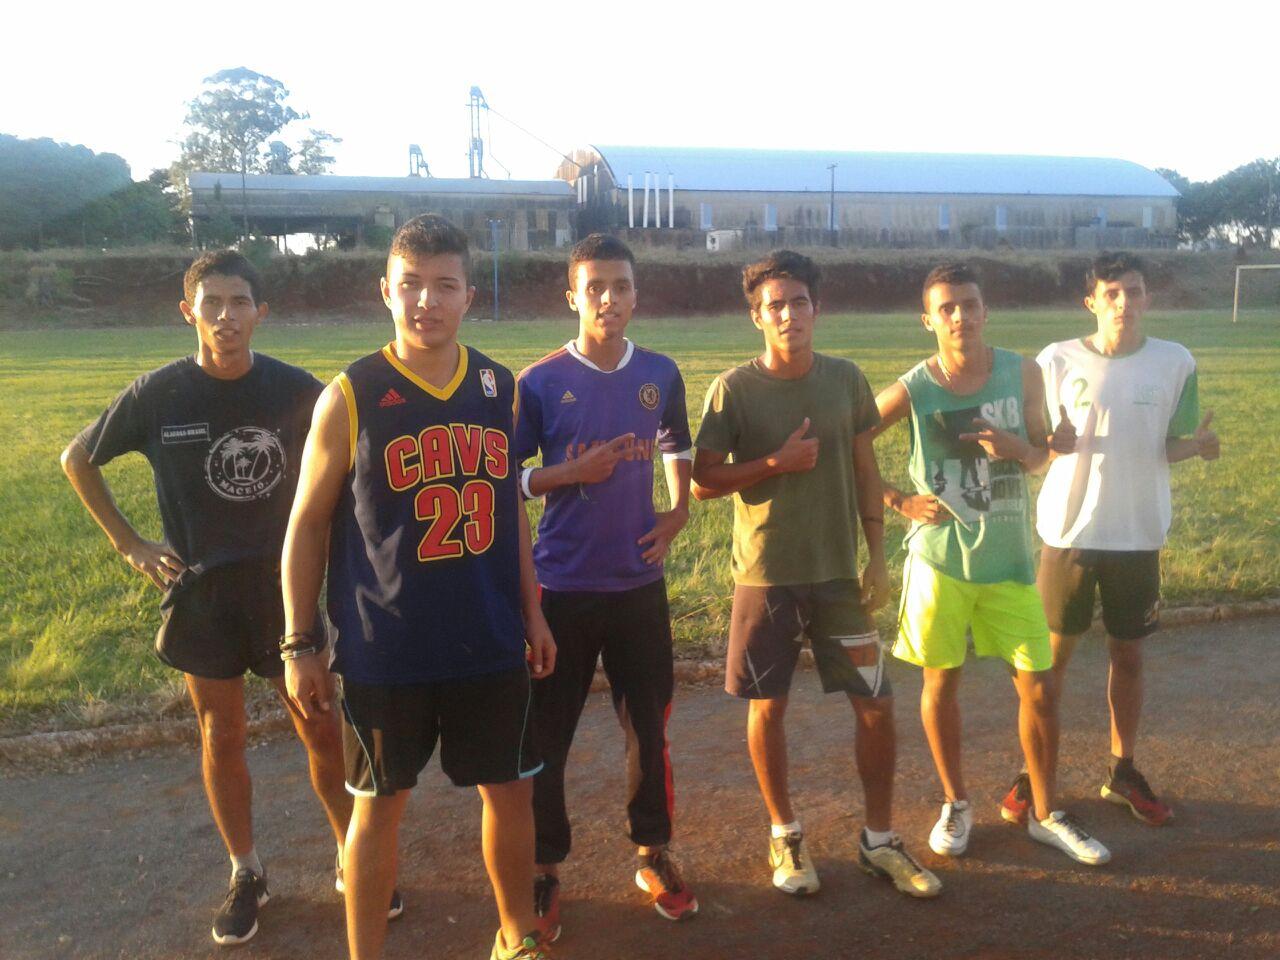 Xadrez e atletismo masculino de Itararé (SP) se classificam à final dos Jogos Abertos da Juventude